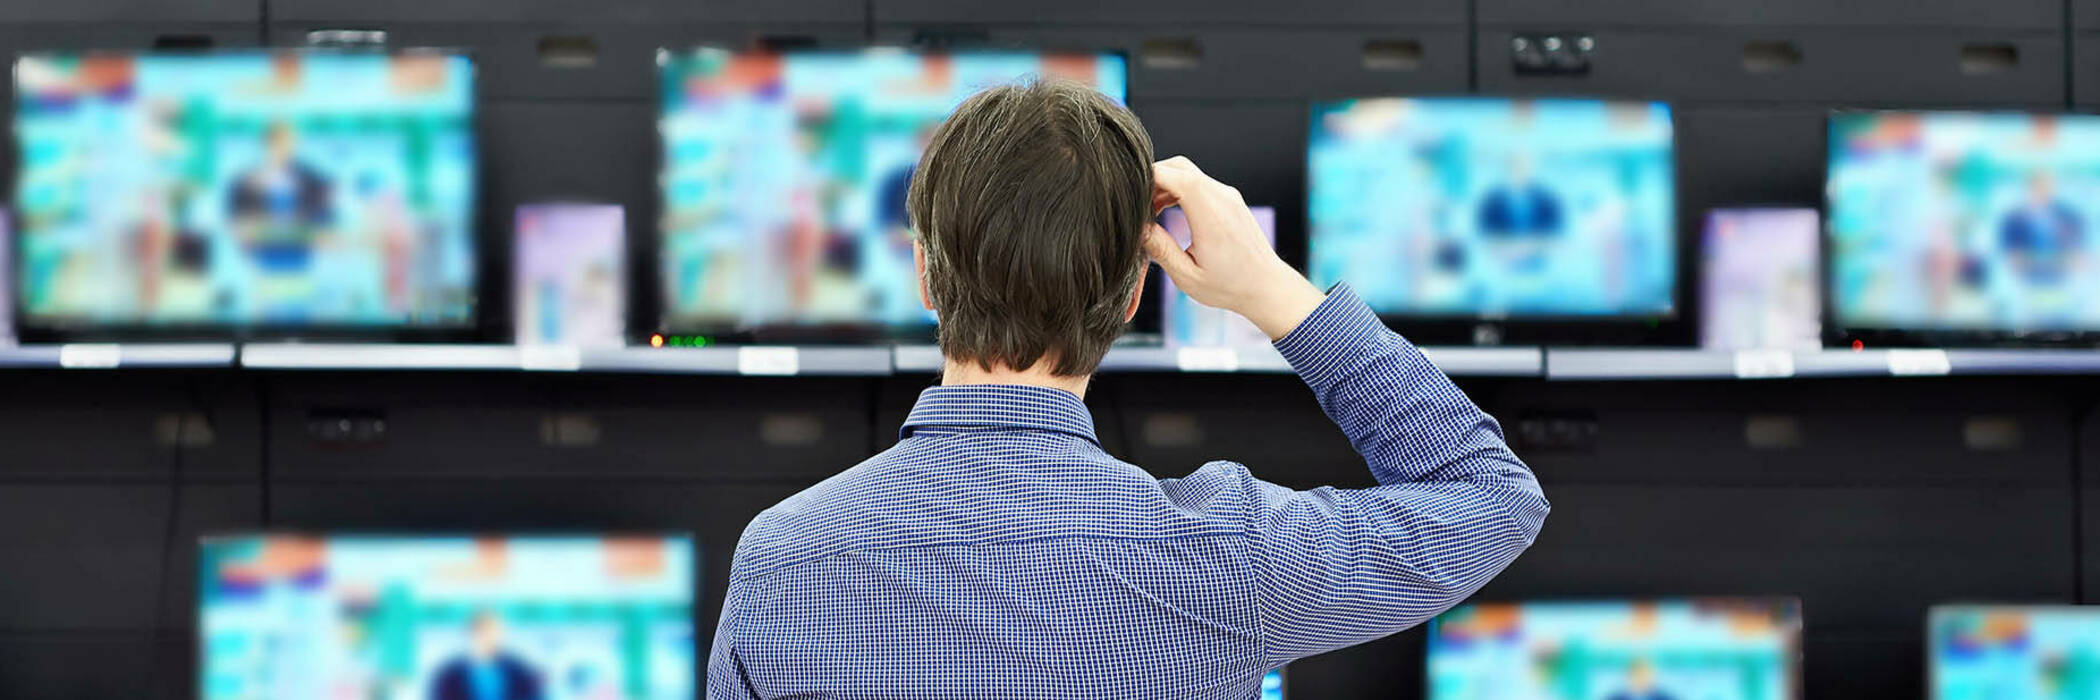 20aug buying a tv hero